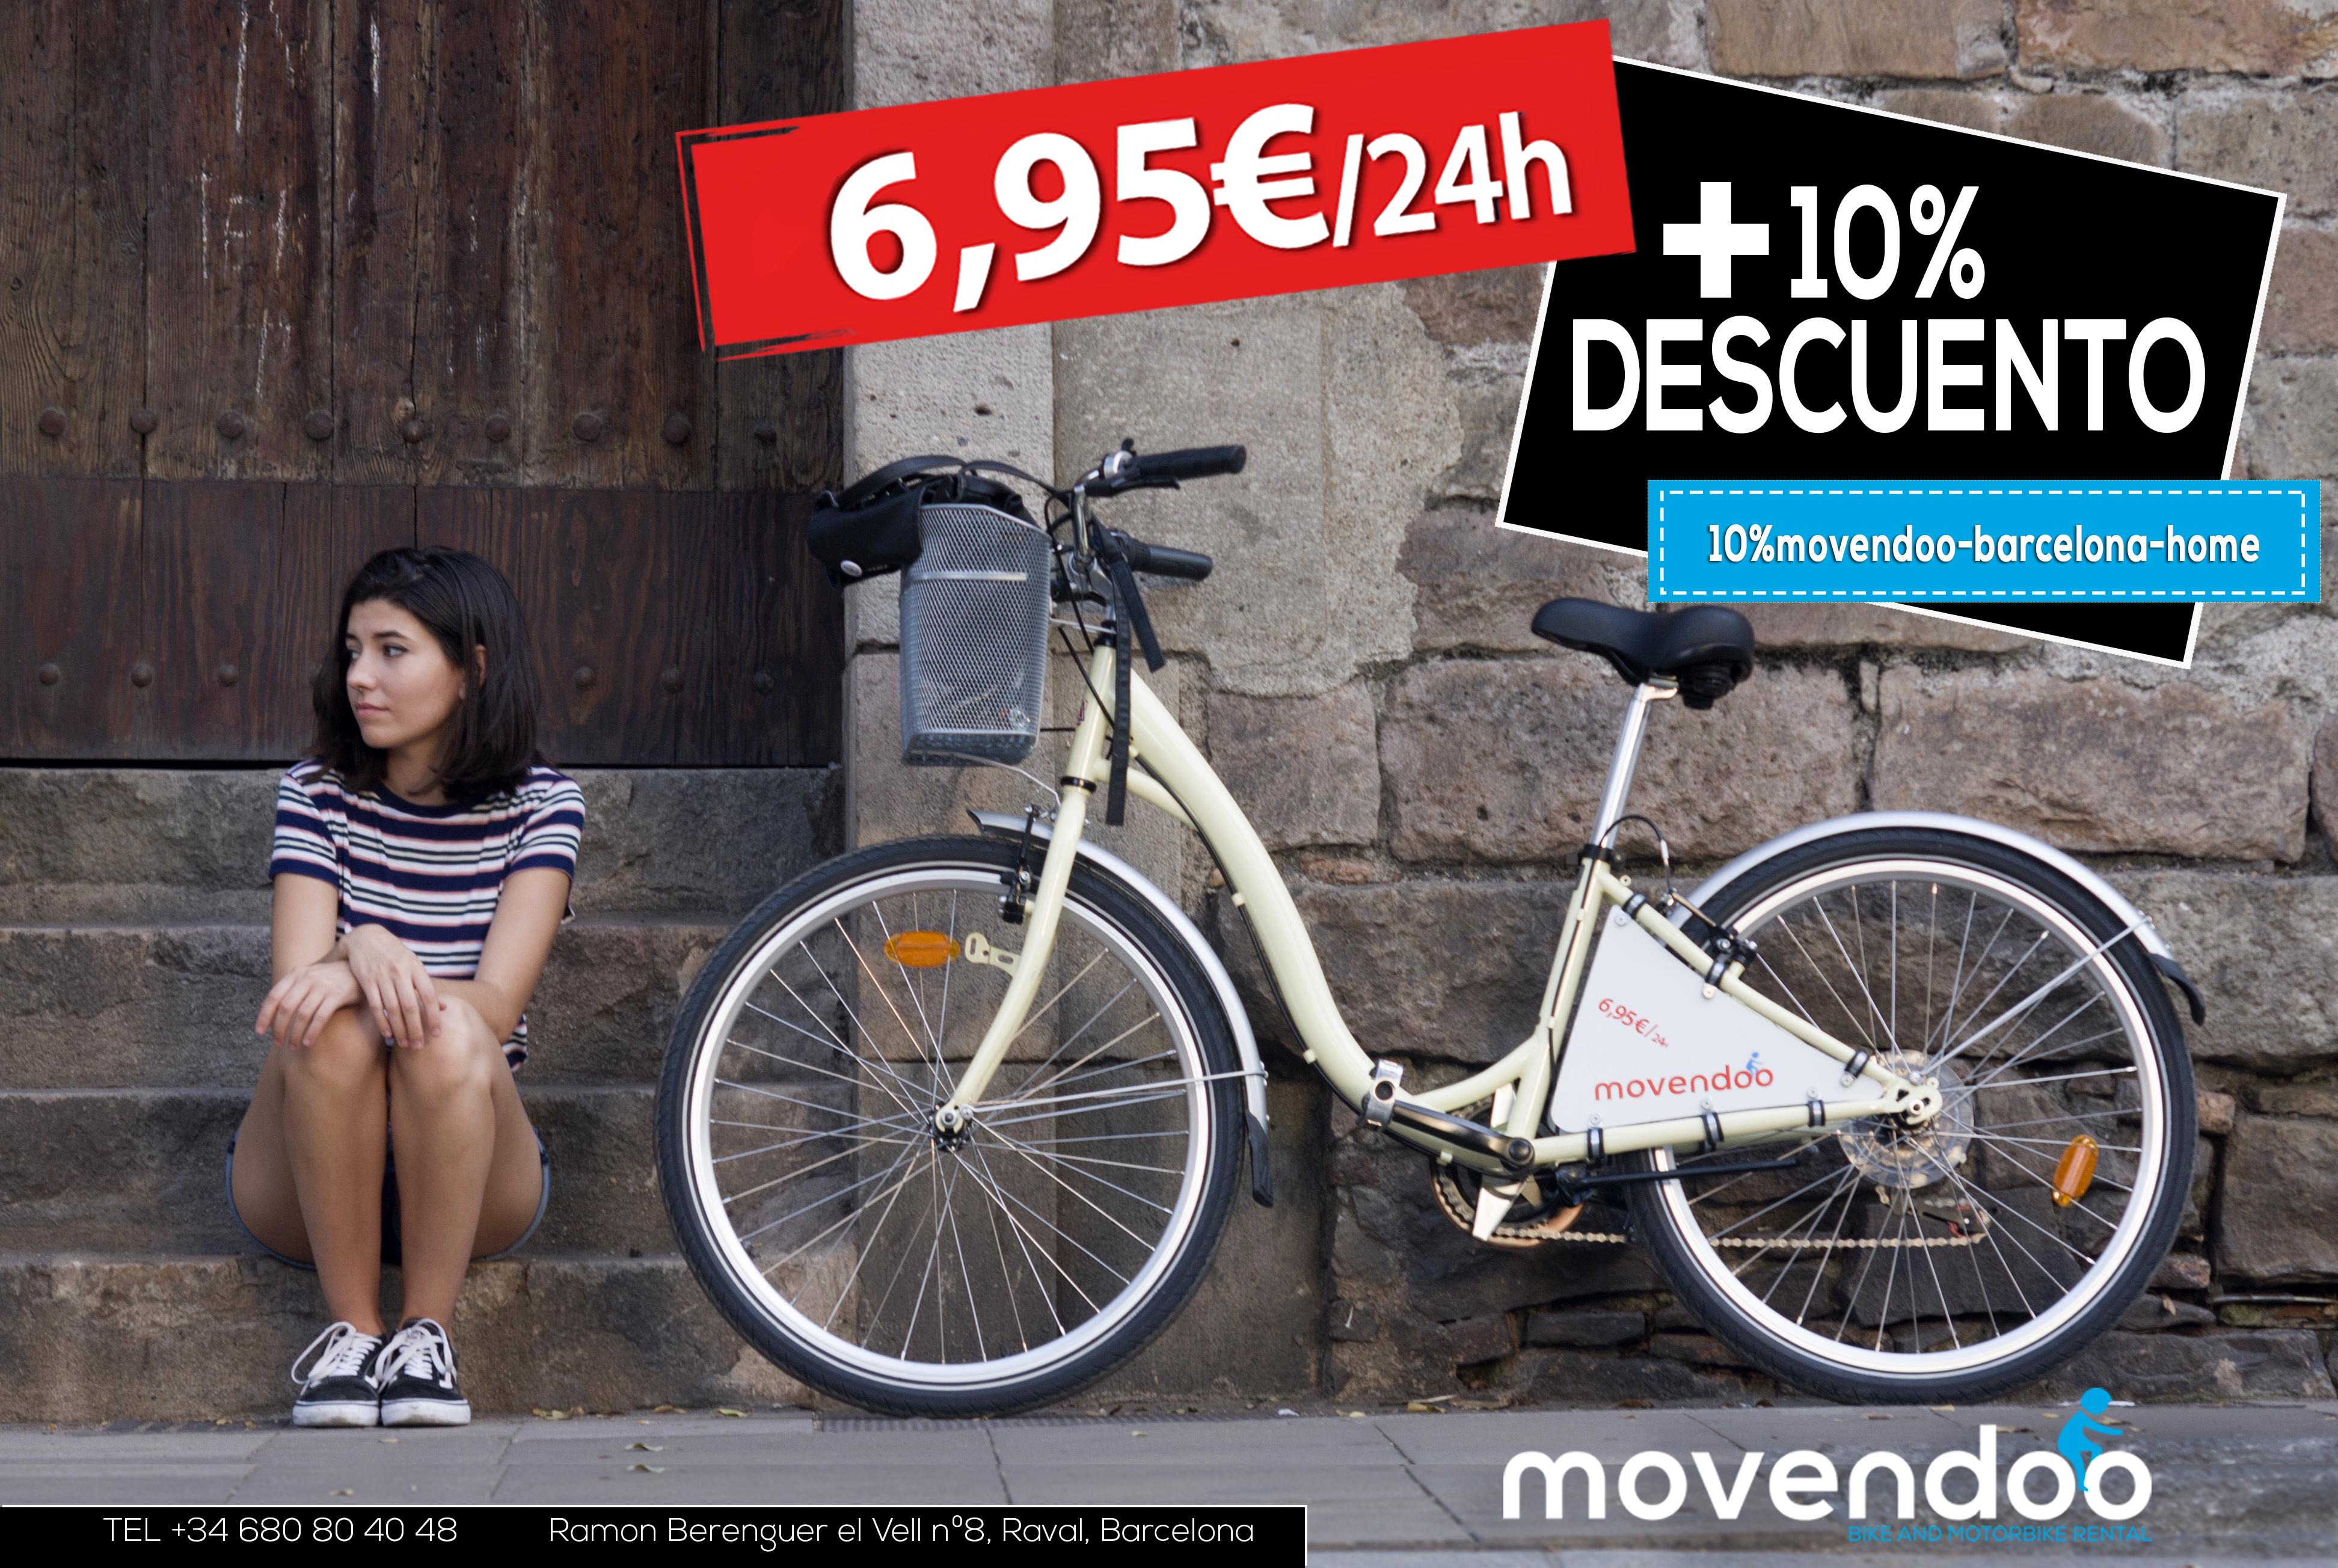 bicicleta barcelona home